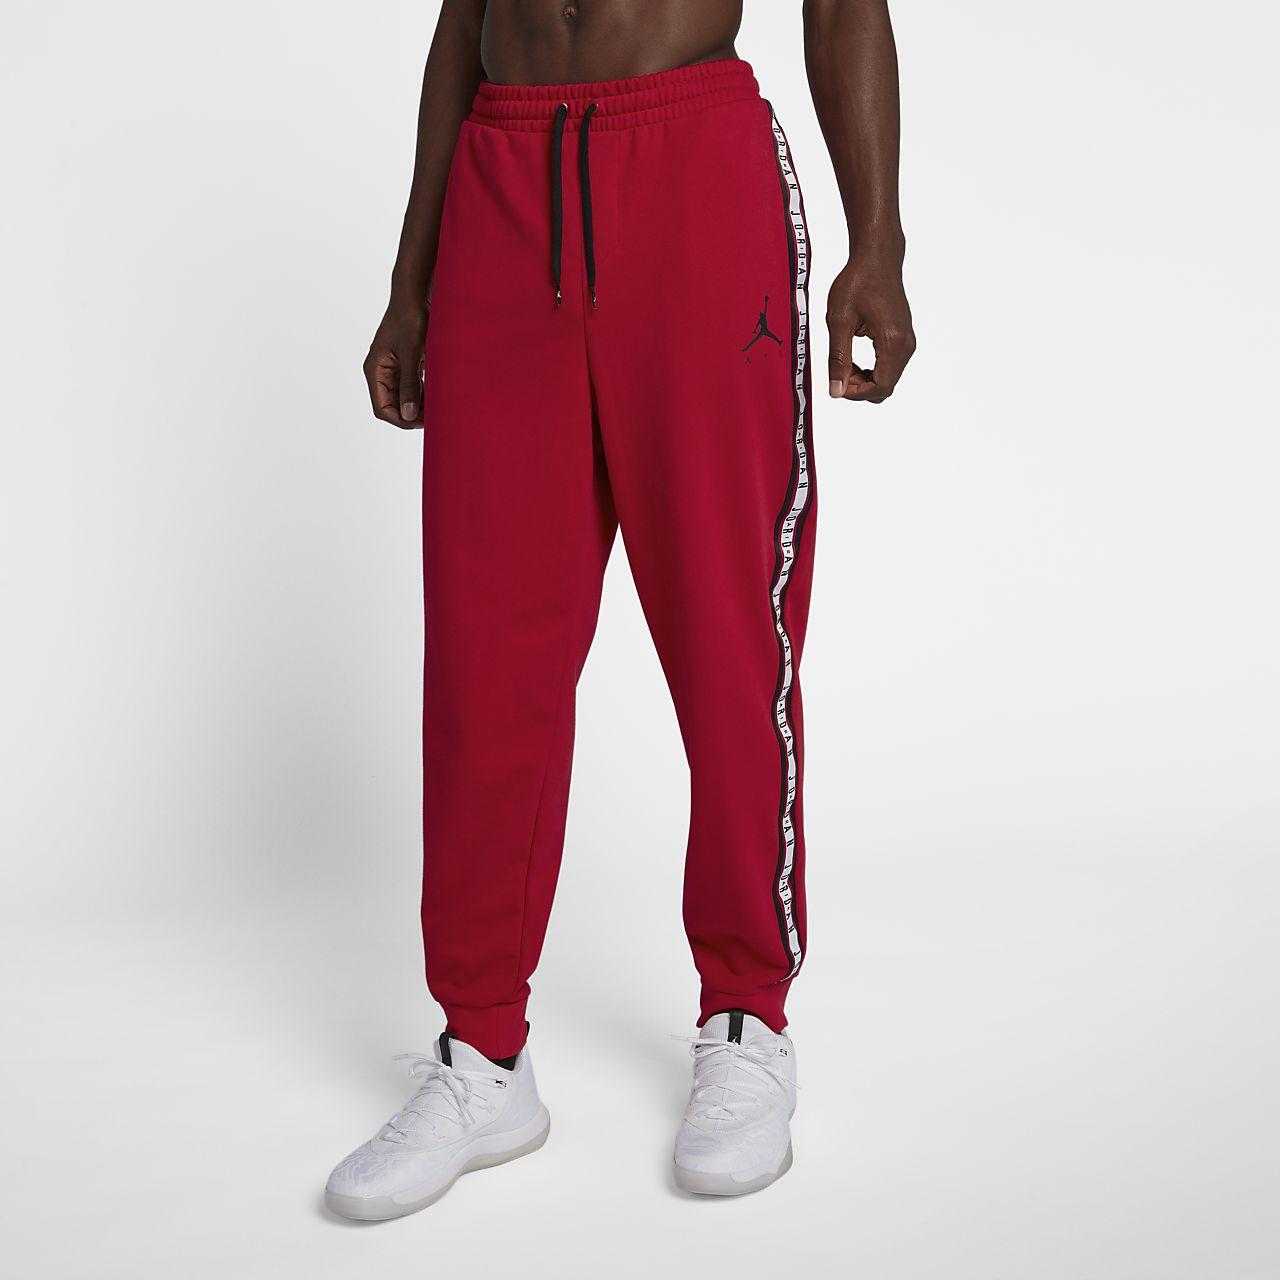 Men/'s Nike Jordan Dri-Fit Big /& Tall Jumpman Basketball Polyester Pants